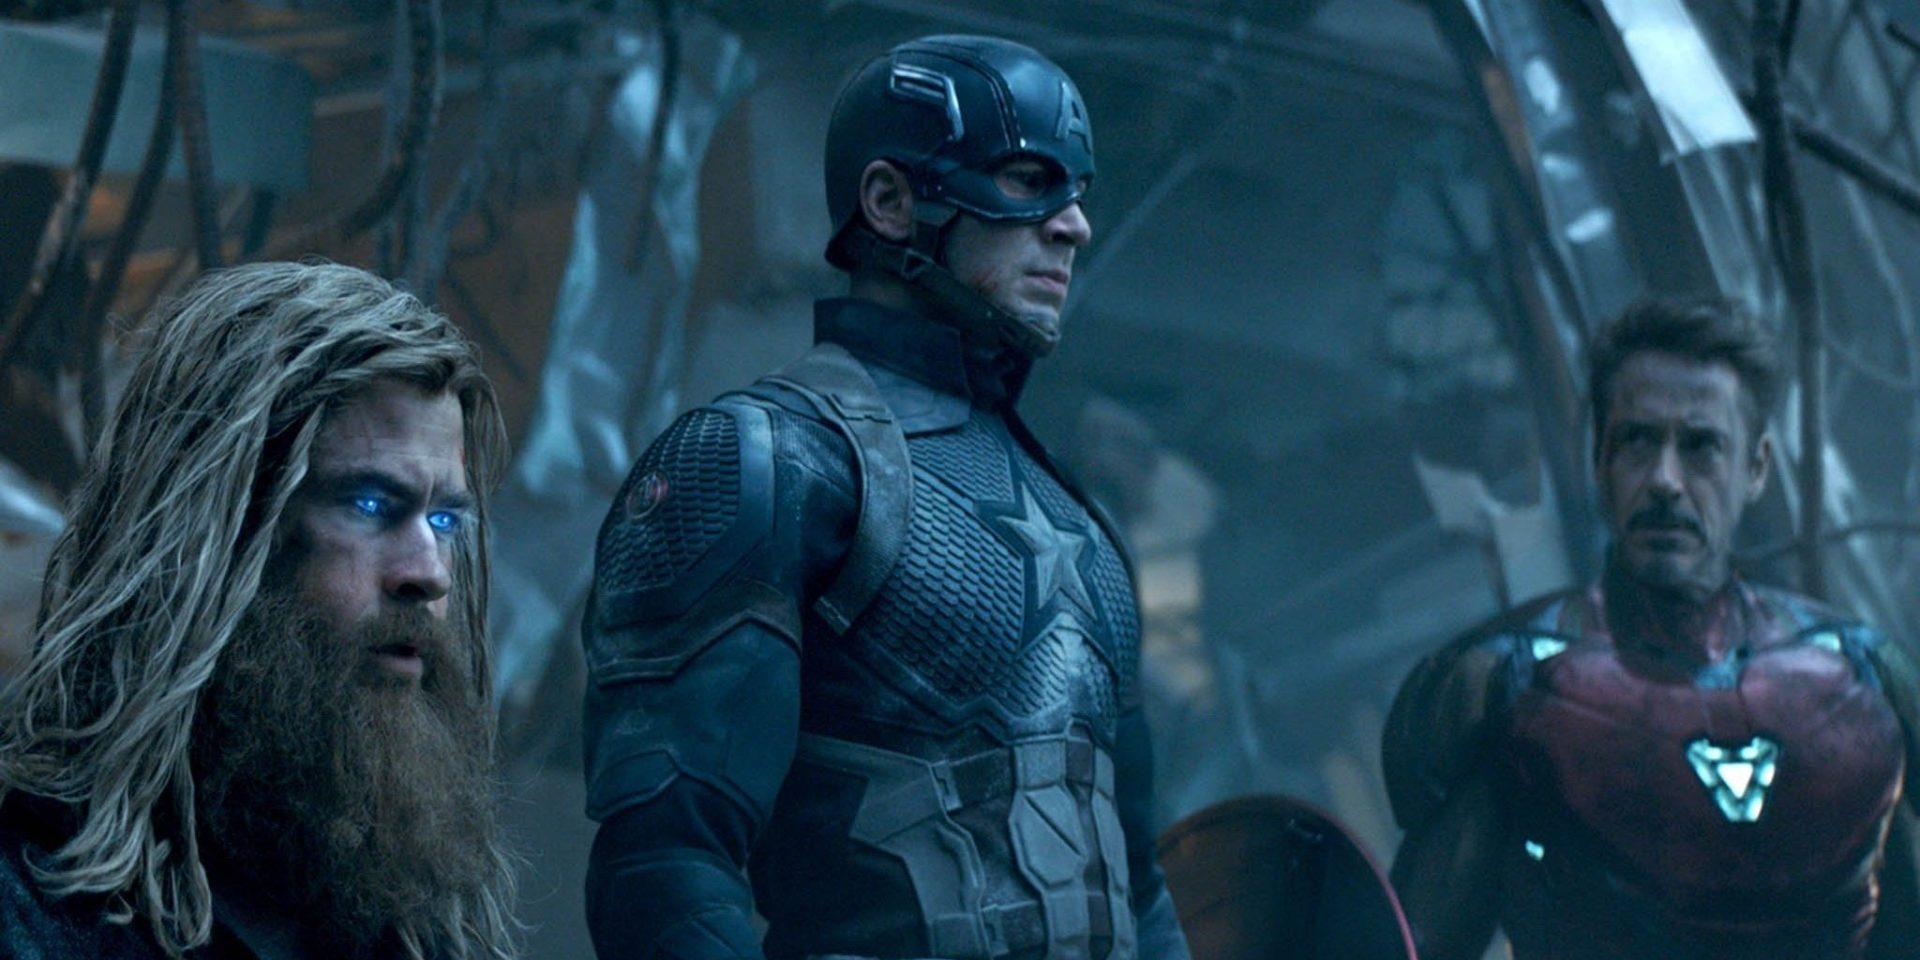 Chris-Hemsworth-Chris-Evans-and-Robert-Downey-Jr.-as-Thor-Captain-America-and-Iron-Man-in-Avengers-Endgame